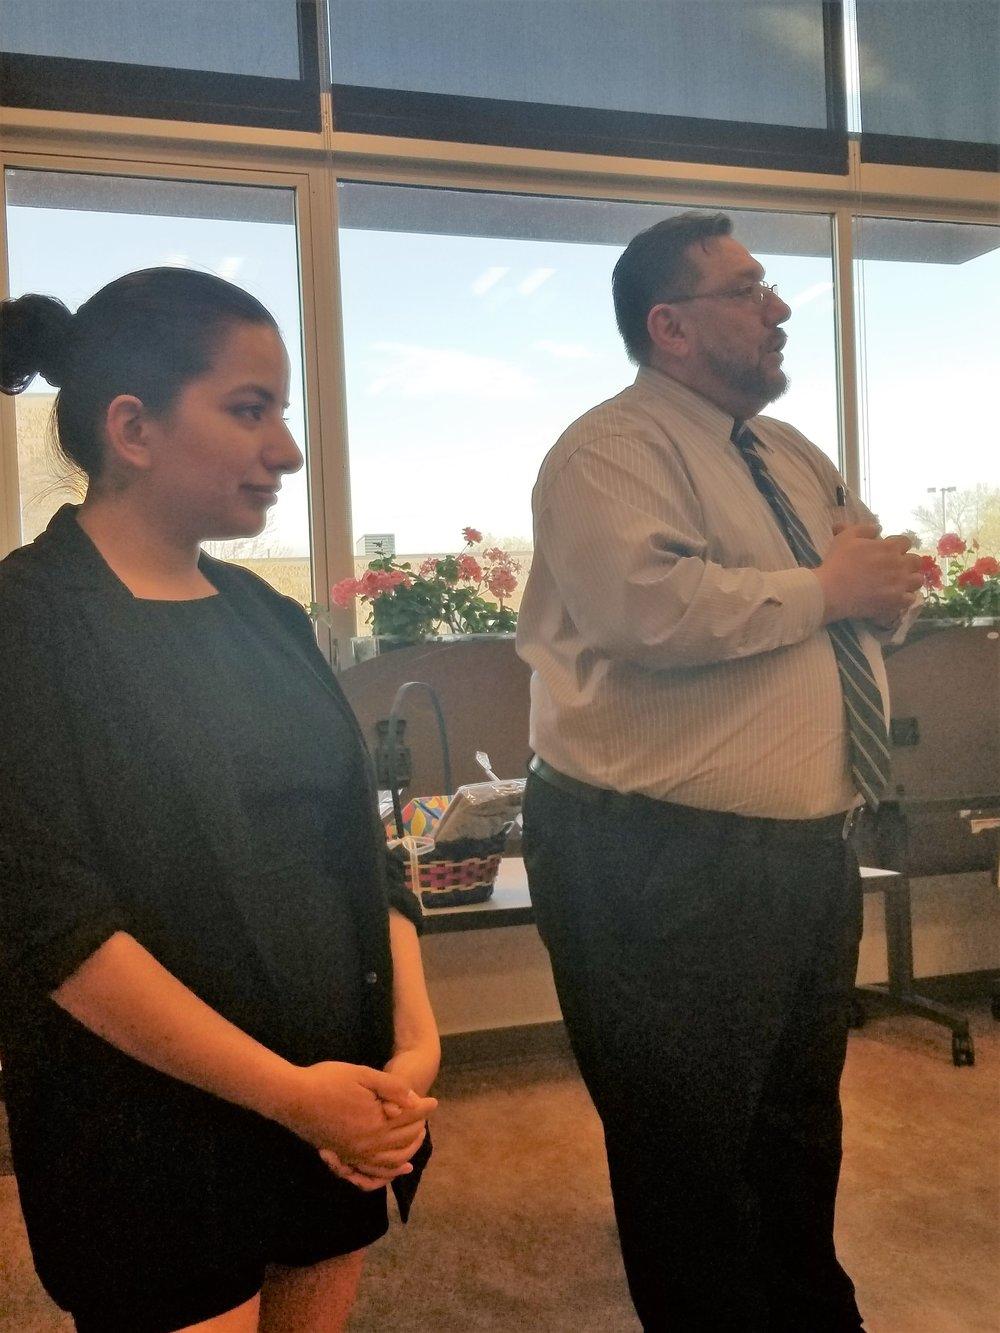 Program facilitators Stephany Murguia-Vega from the Rape Recovery Center and Javier Campos from Centro de la Familia de Utah offering congratulations to the families graduating from the 8 week  Nuestras Familias, Nuestra Salud  program.